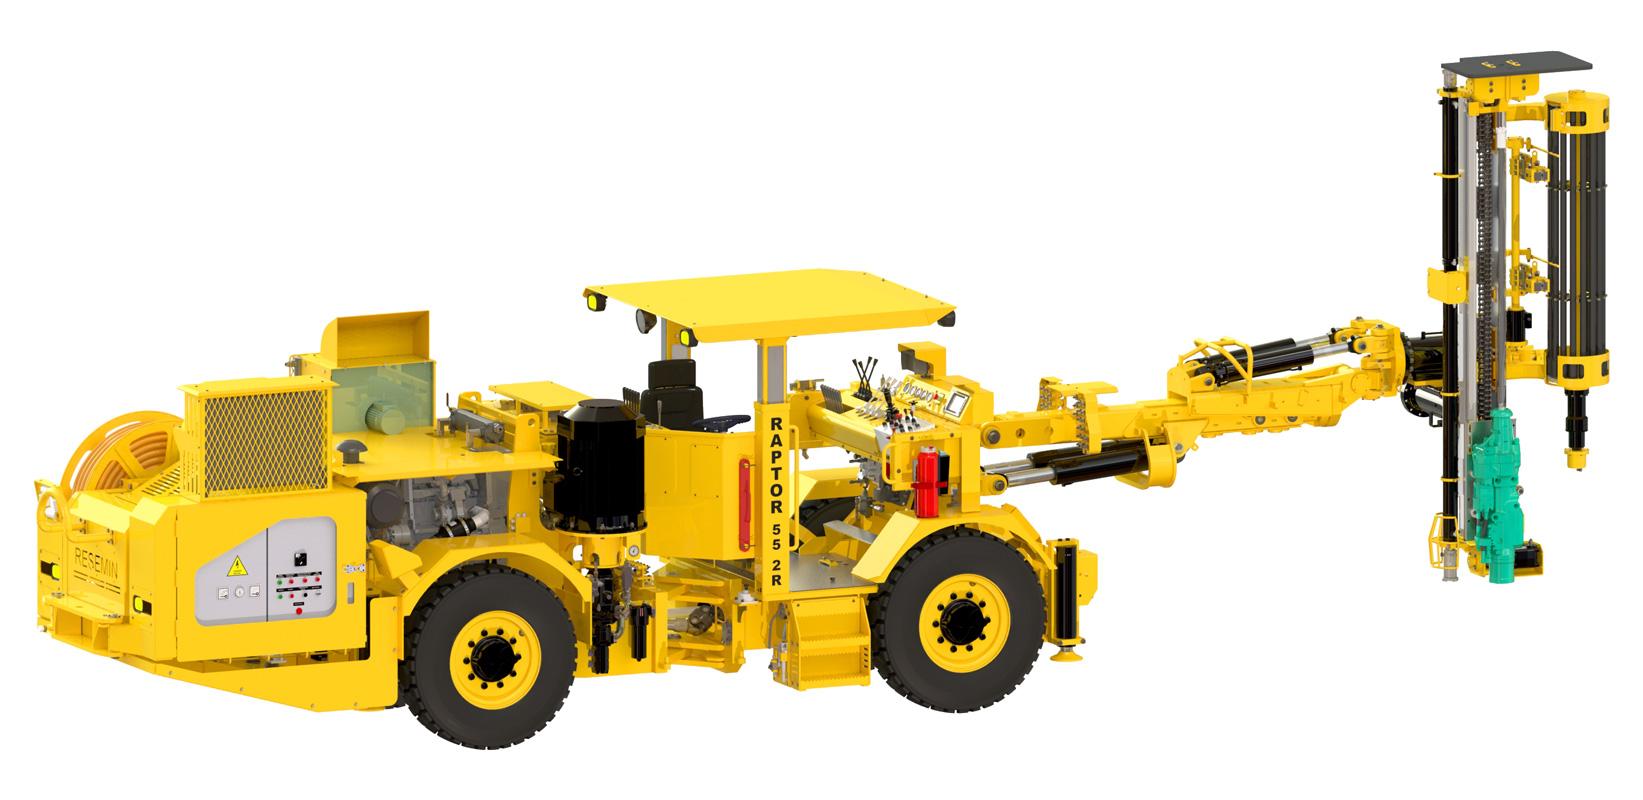 RAPTOR 55-2R